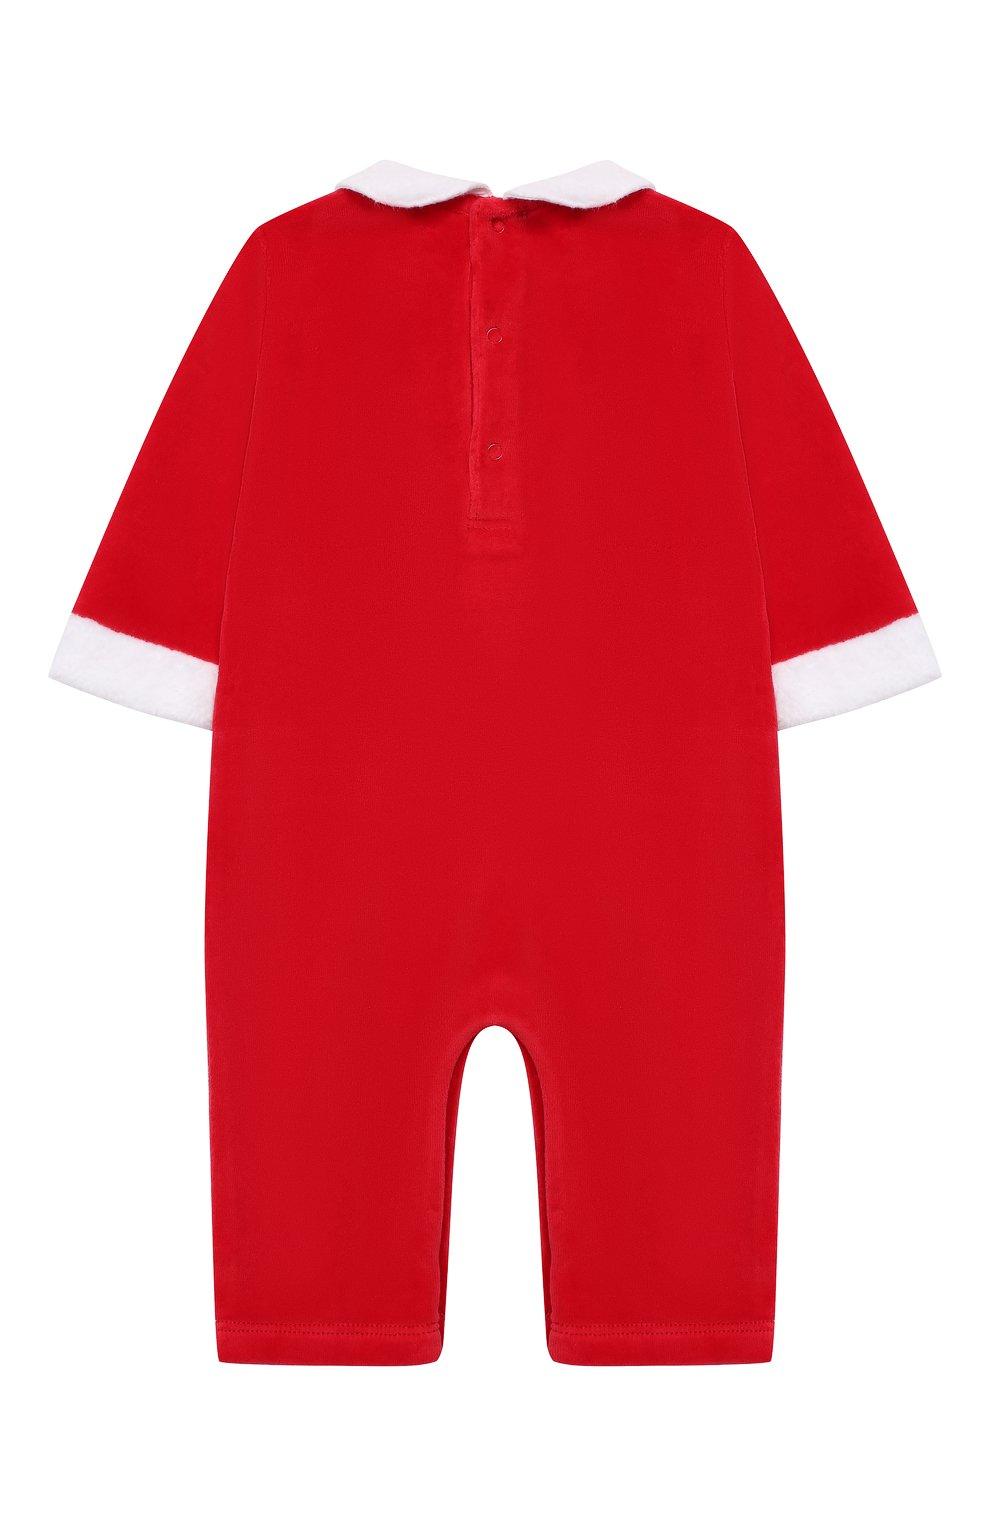 Детский хлопковый комбинезон KISSY KISSY красного цвета, арт. KN802435I   Фото 2 (Рукава: Короткие; Материал внешний: Хлопок)